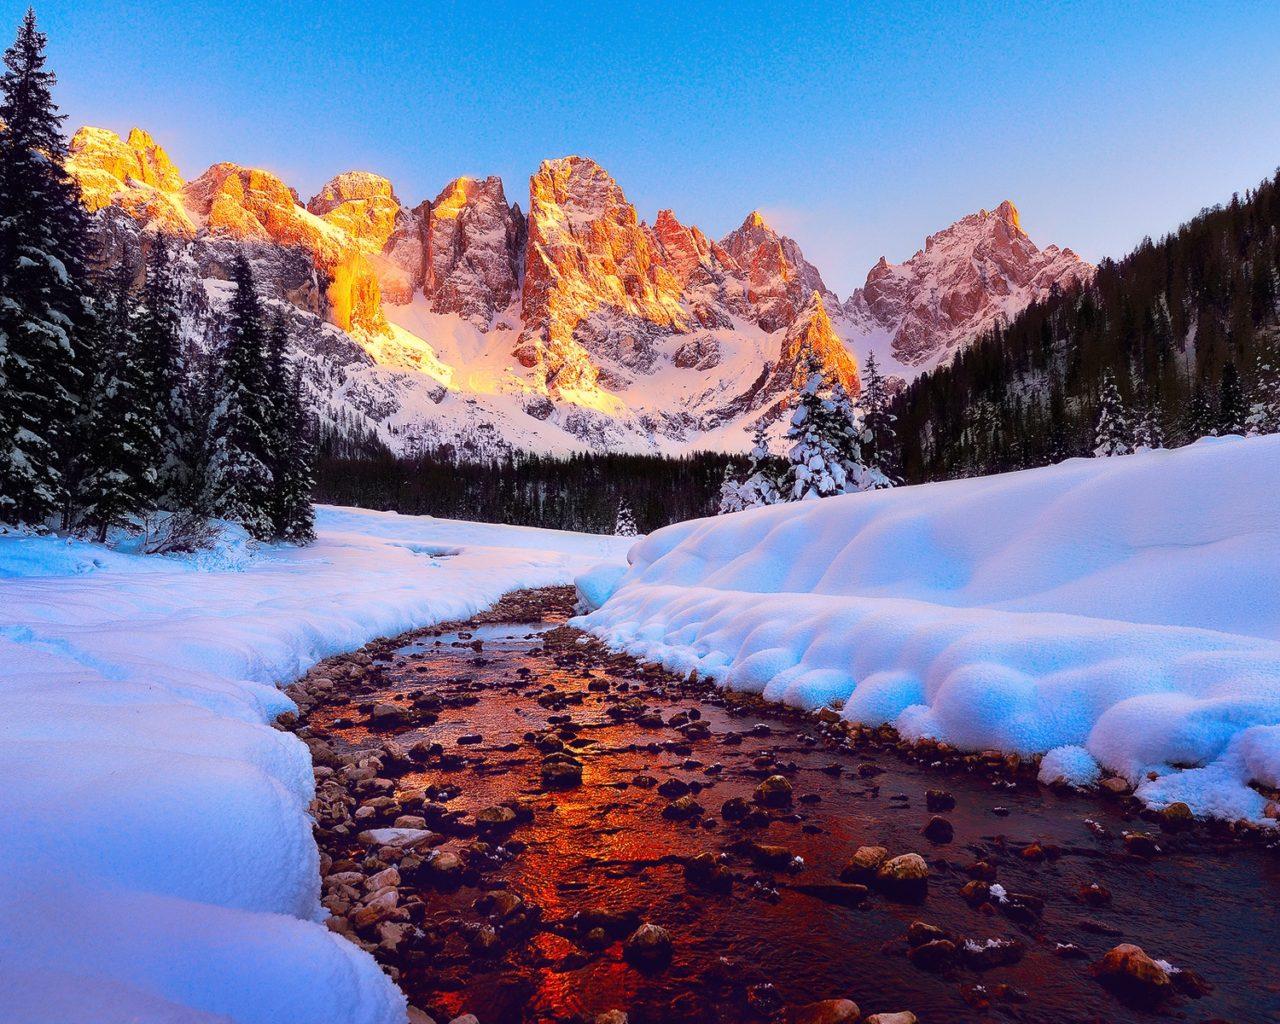 Falling Snow Wallpaper Download Dolomites Mountain Peaks In Italy Sunrise Winter Snow